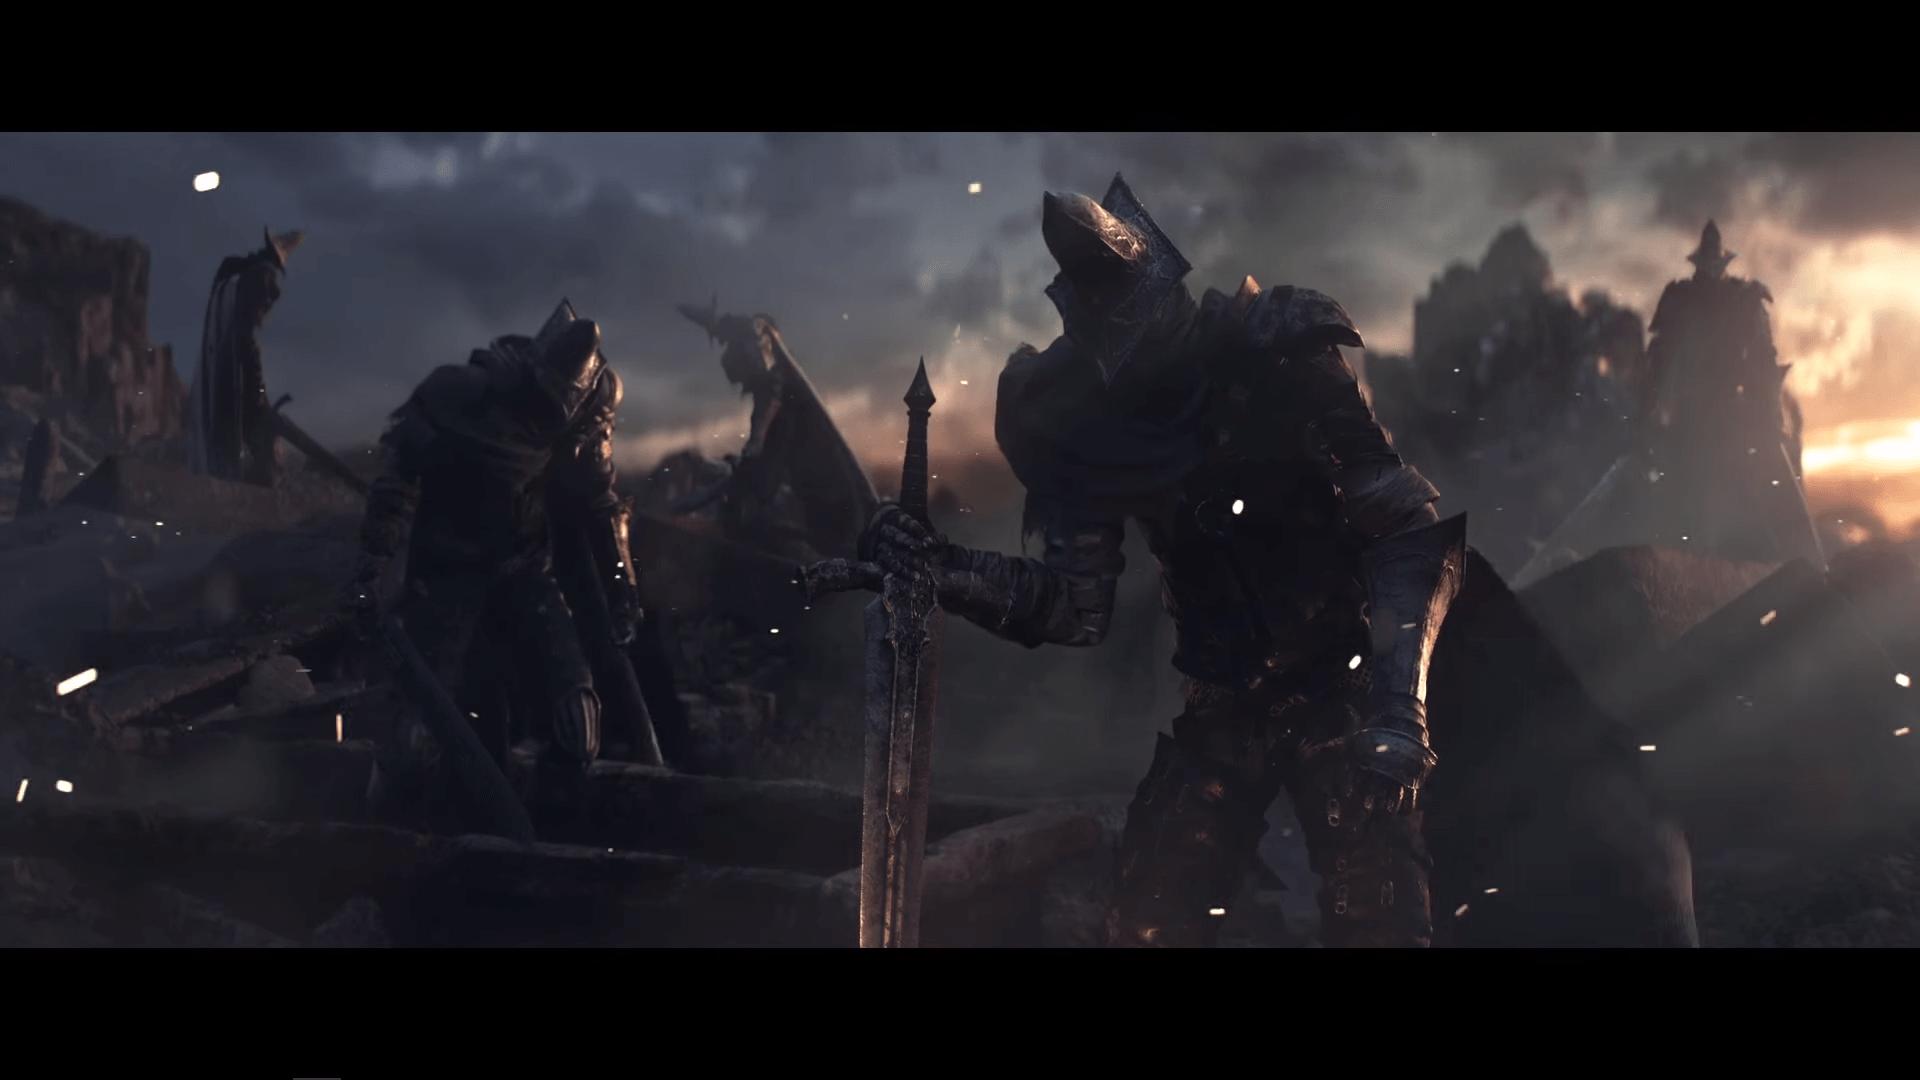 3d Action Game Wallpaper Dark Souls 3 Onrpg